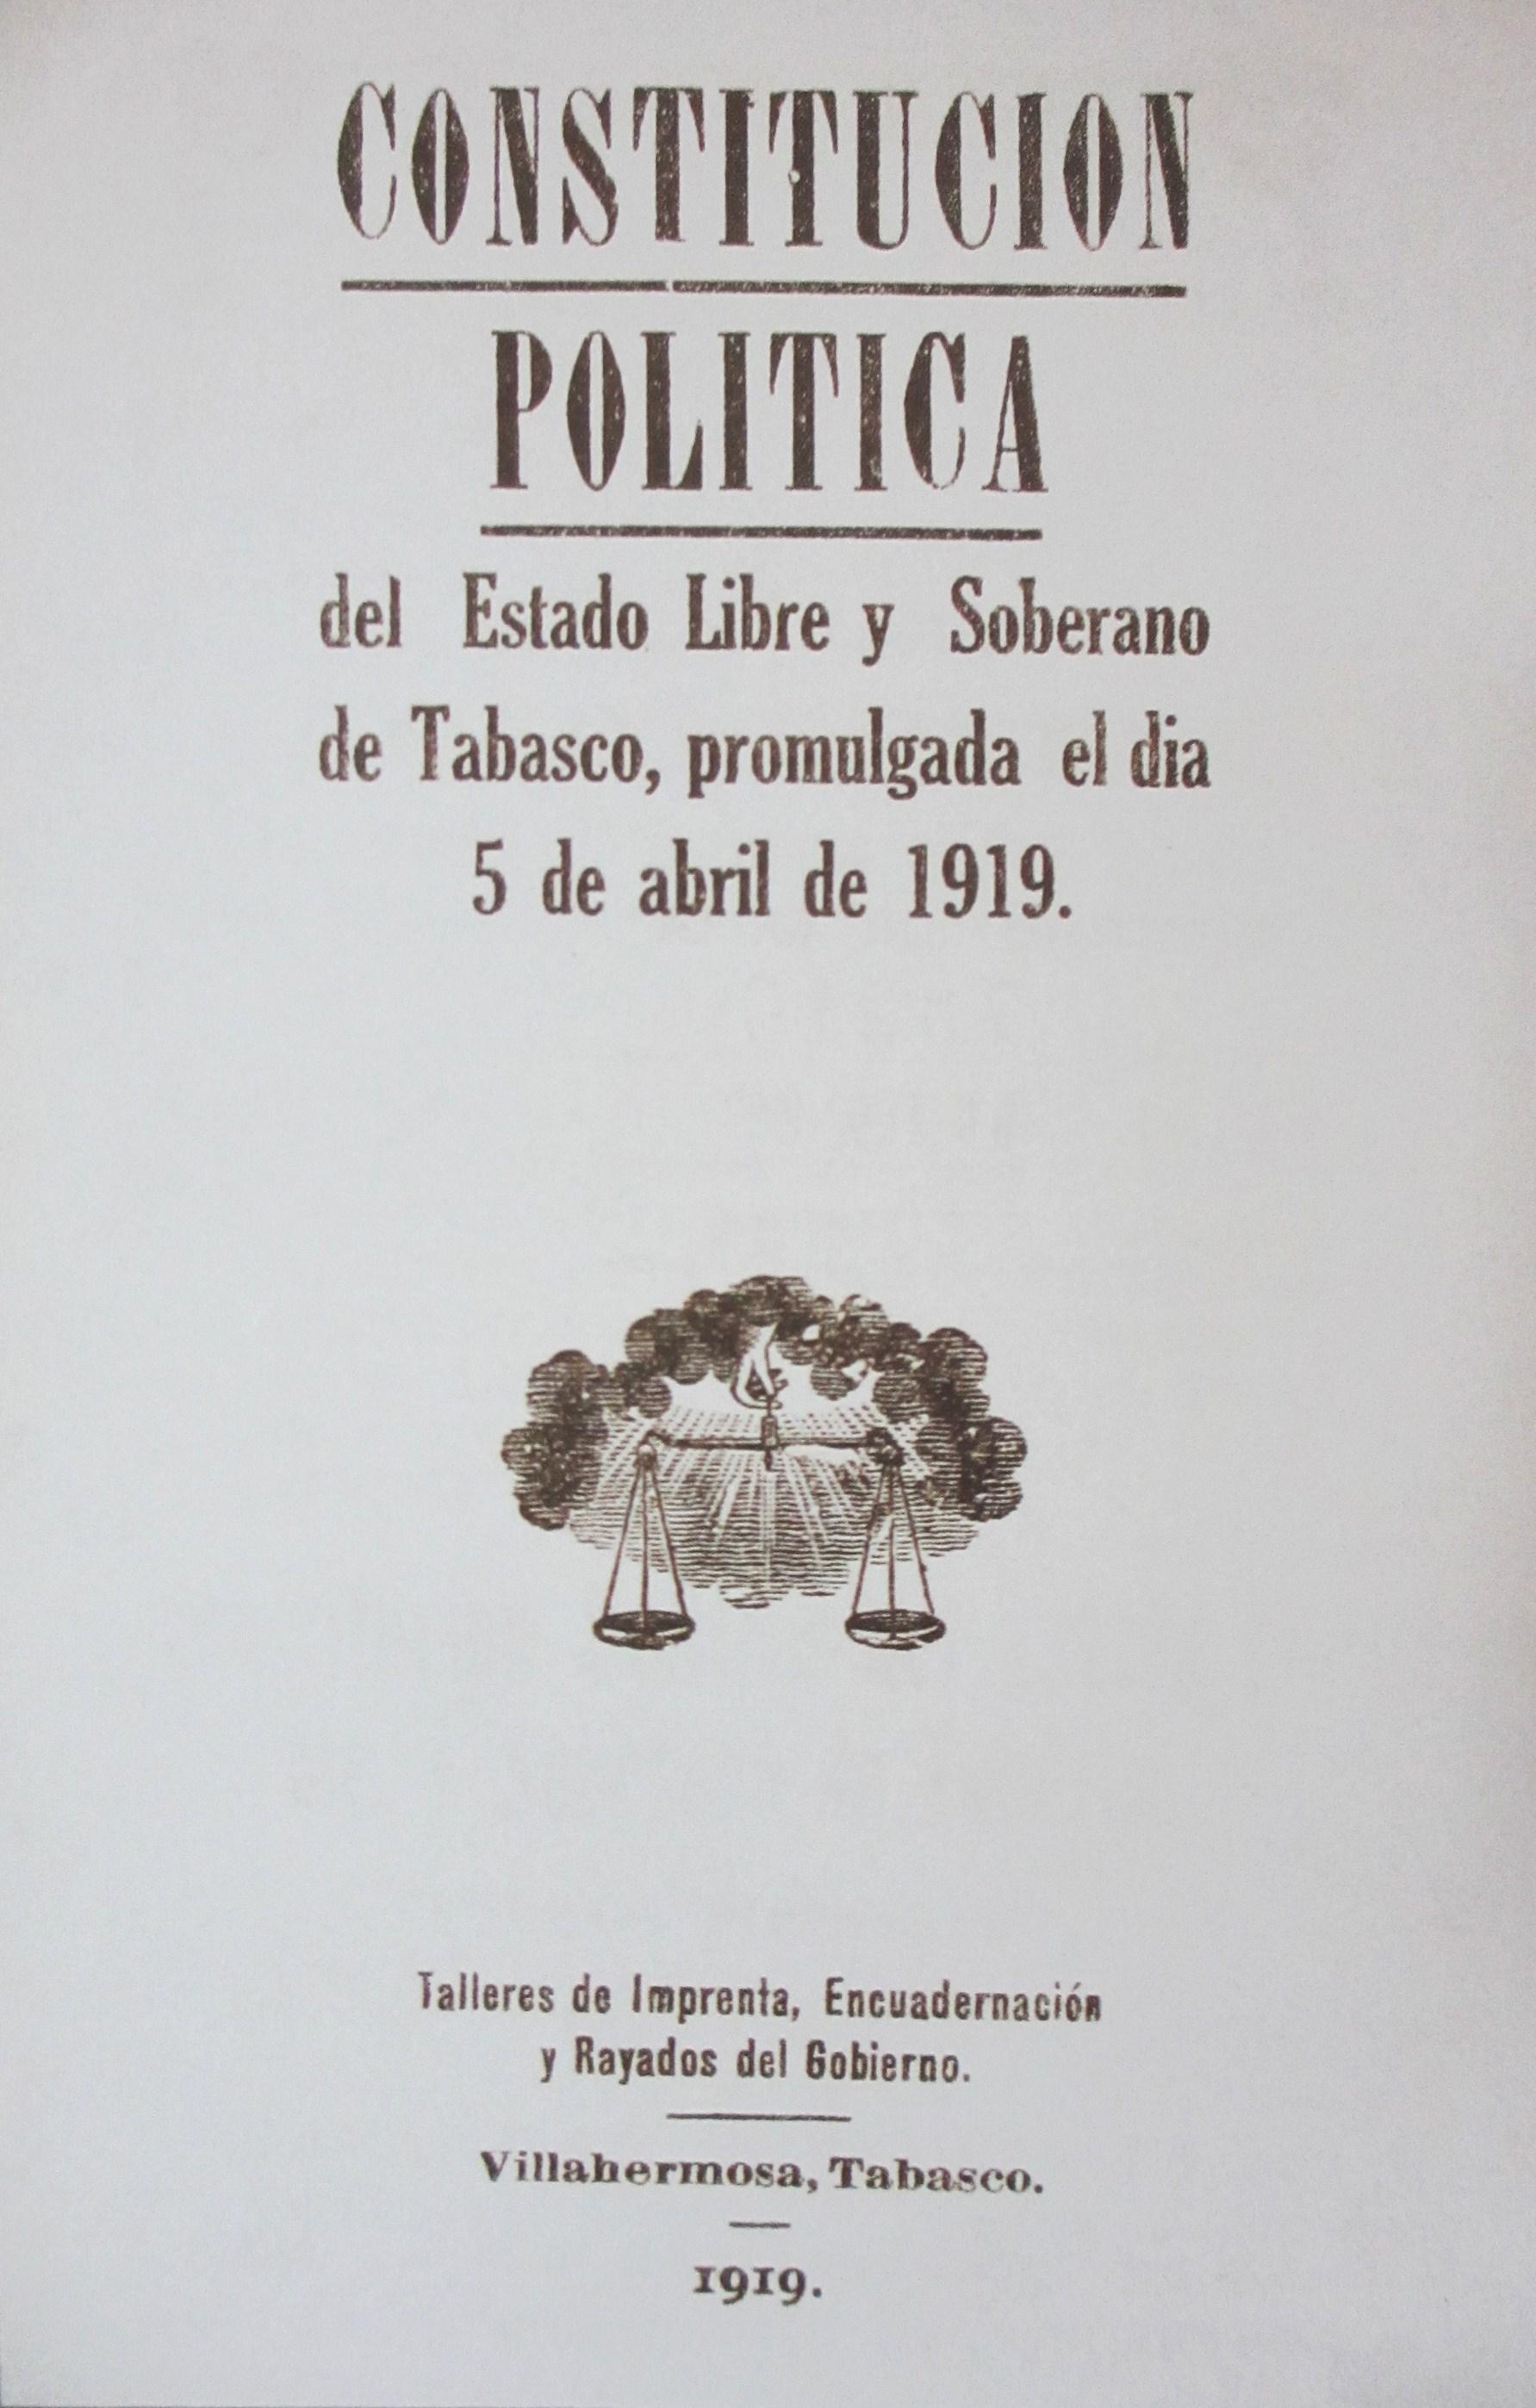 Constituci n pol tica del estado de tabasco wikipedia for Que es un articulo cultural o de espectaculos